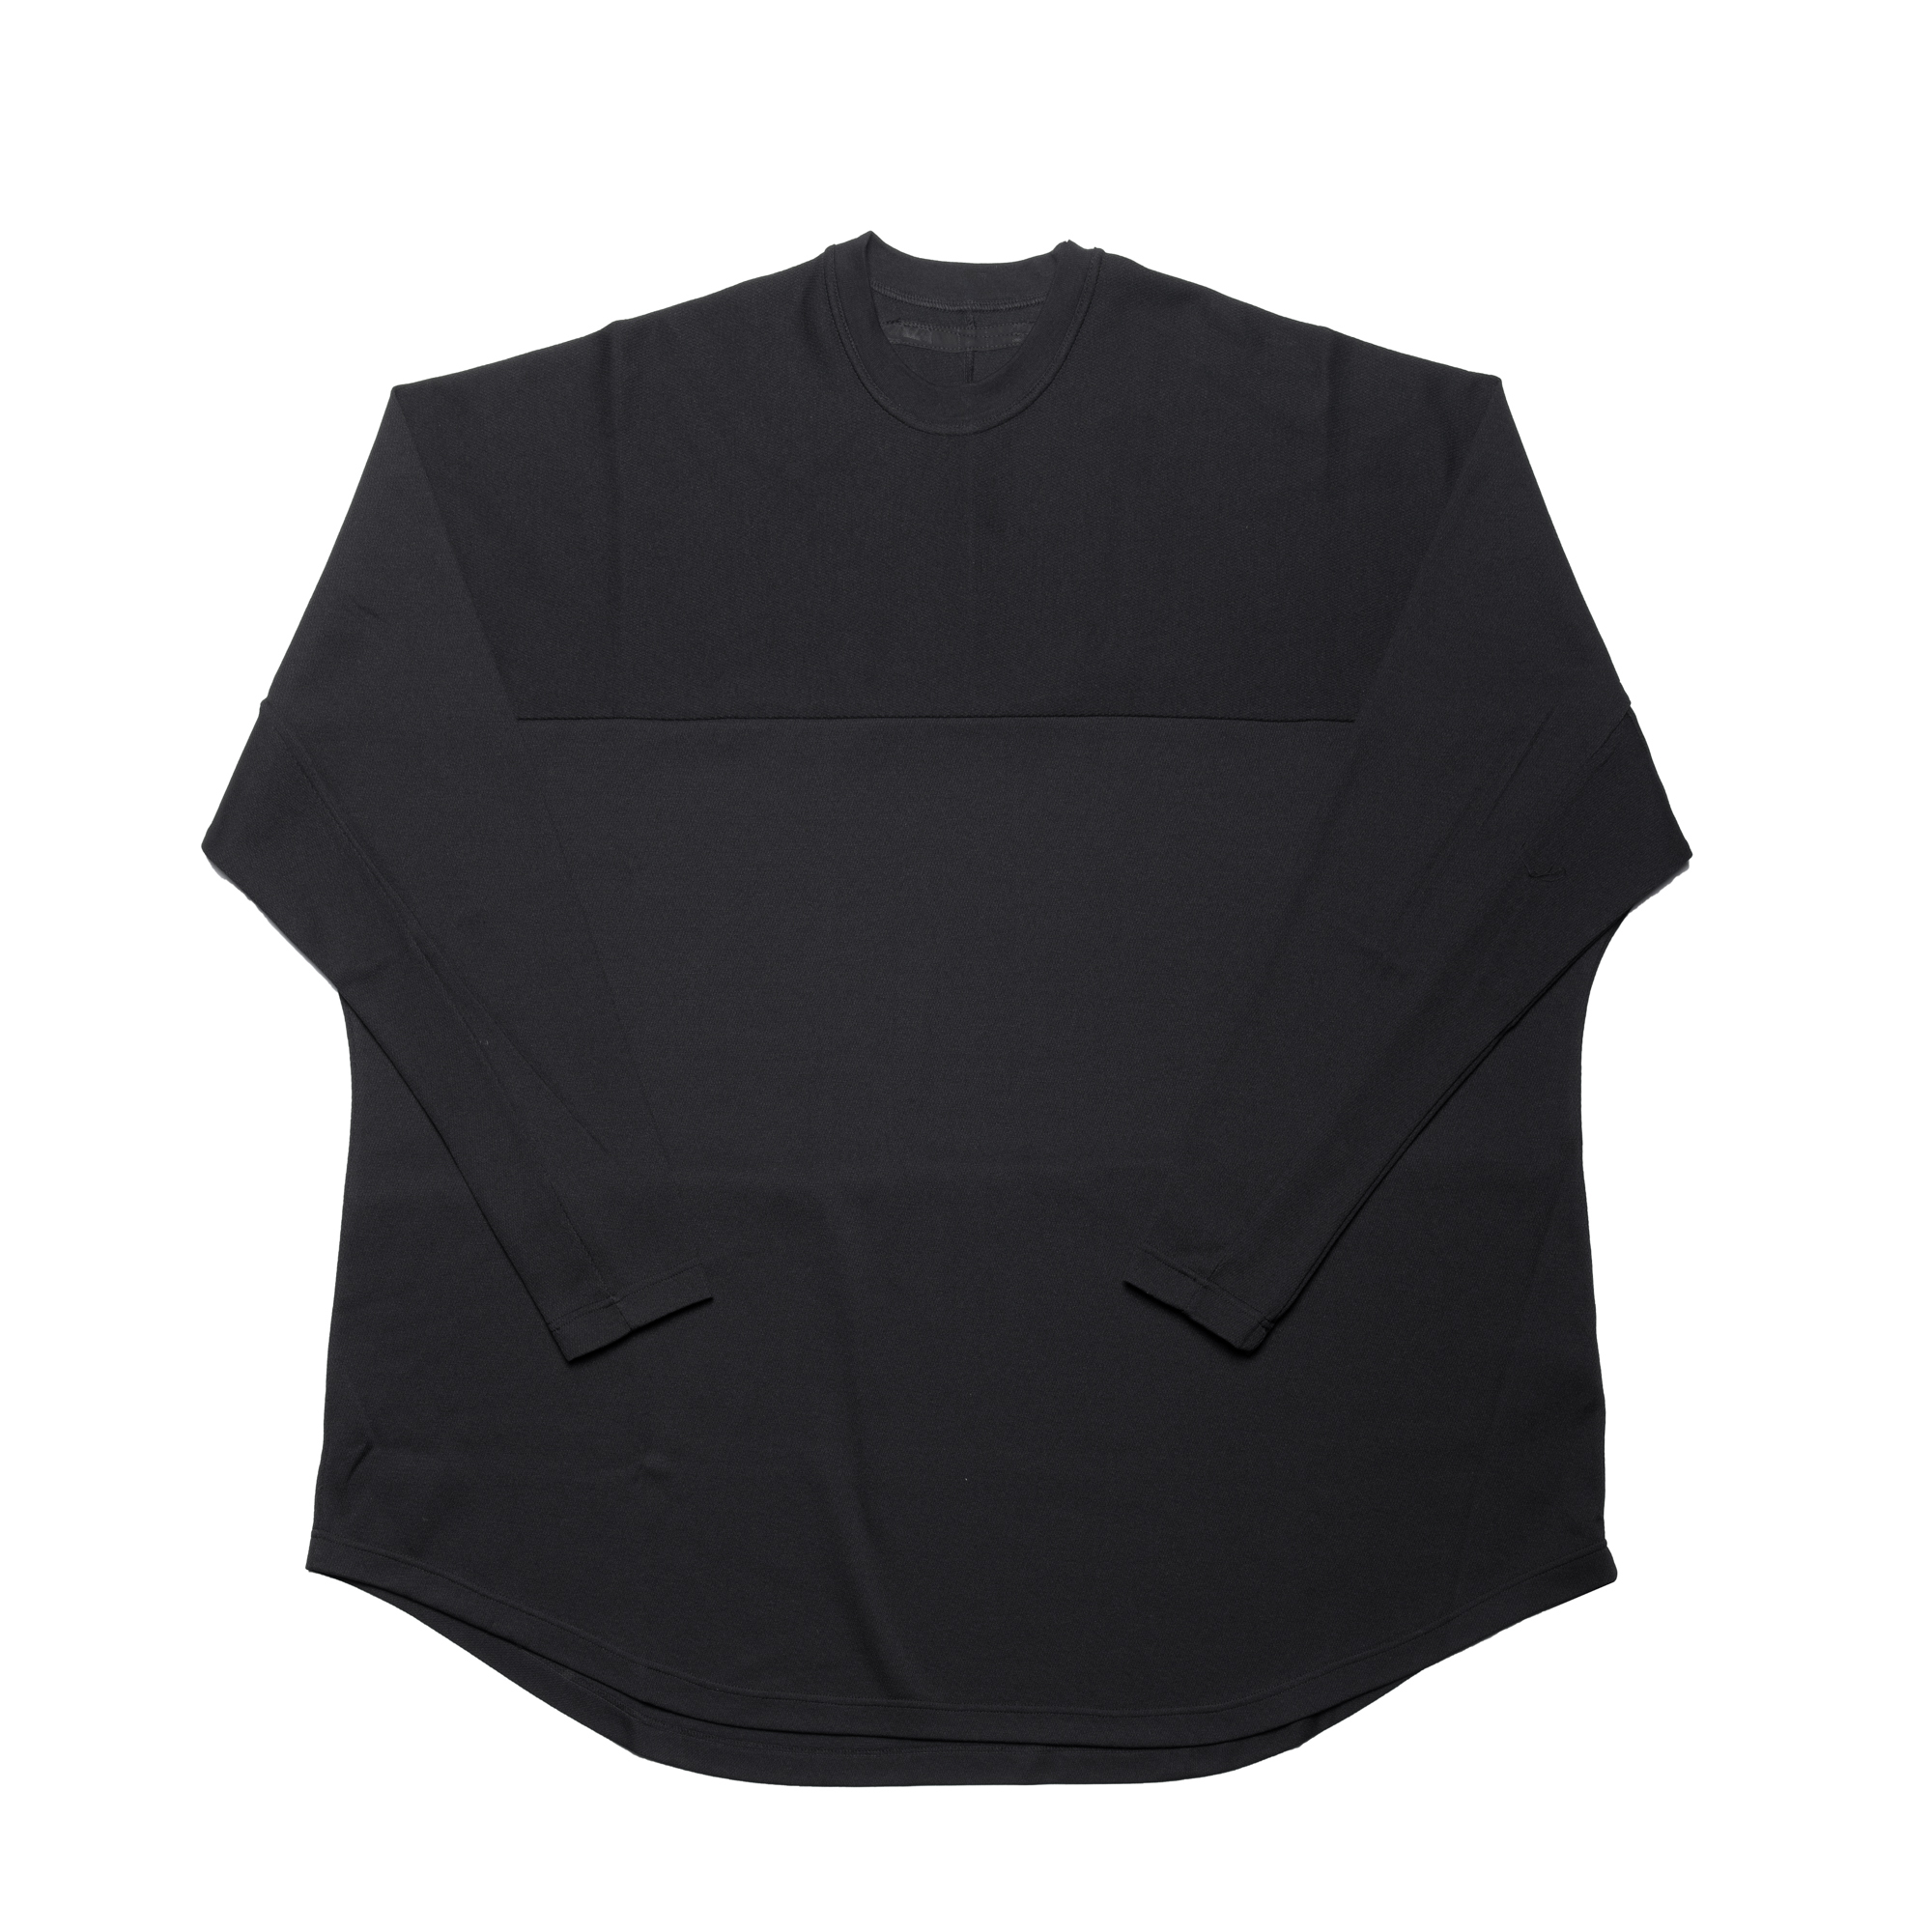 660CUM2-BLACK / ラインスリーブ エクストラビック ラウンドTシャツ